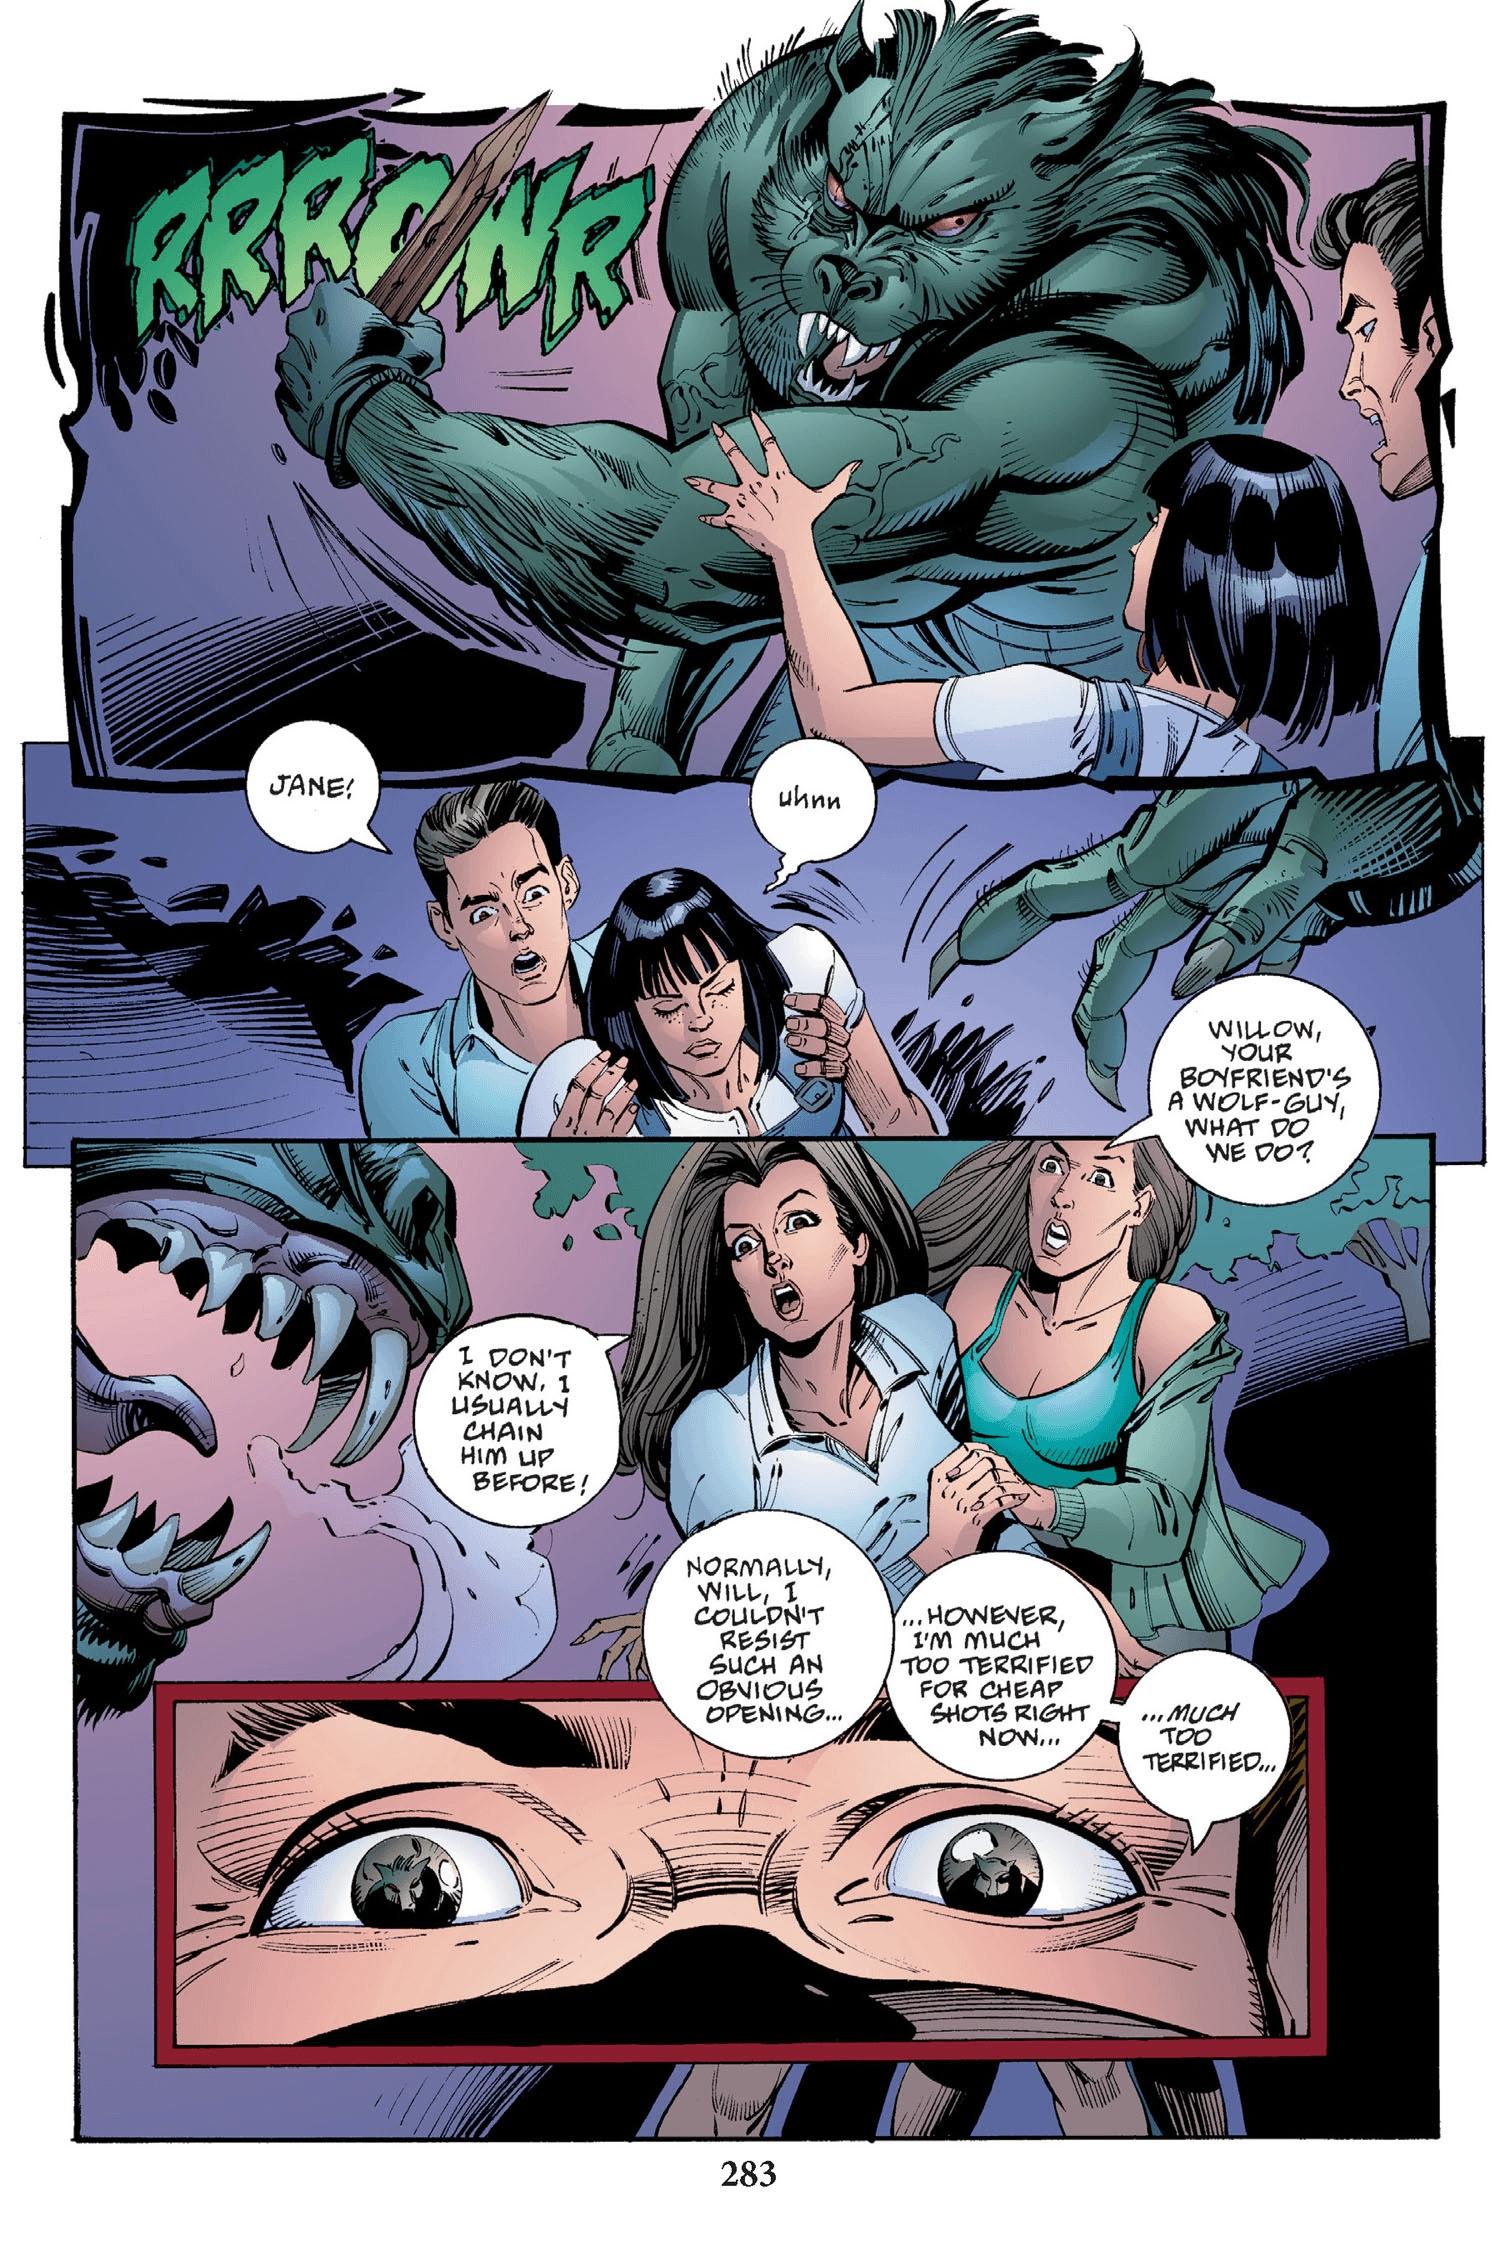 Read online Buffy the Vampire Slayer: Omnibus comic -  Issue # TPB 2 - 275